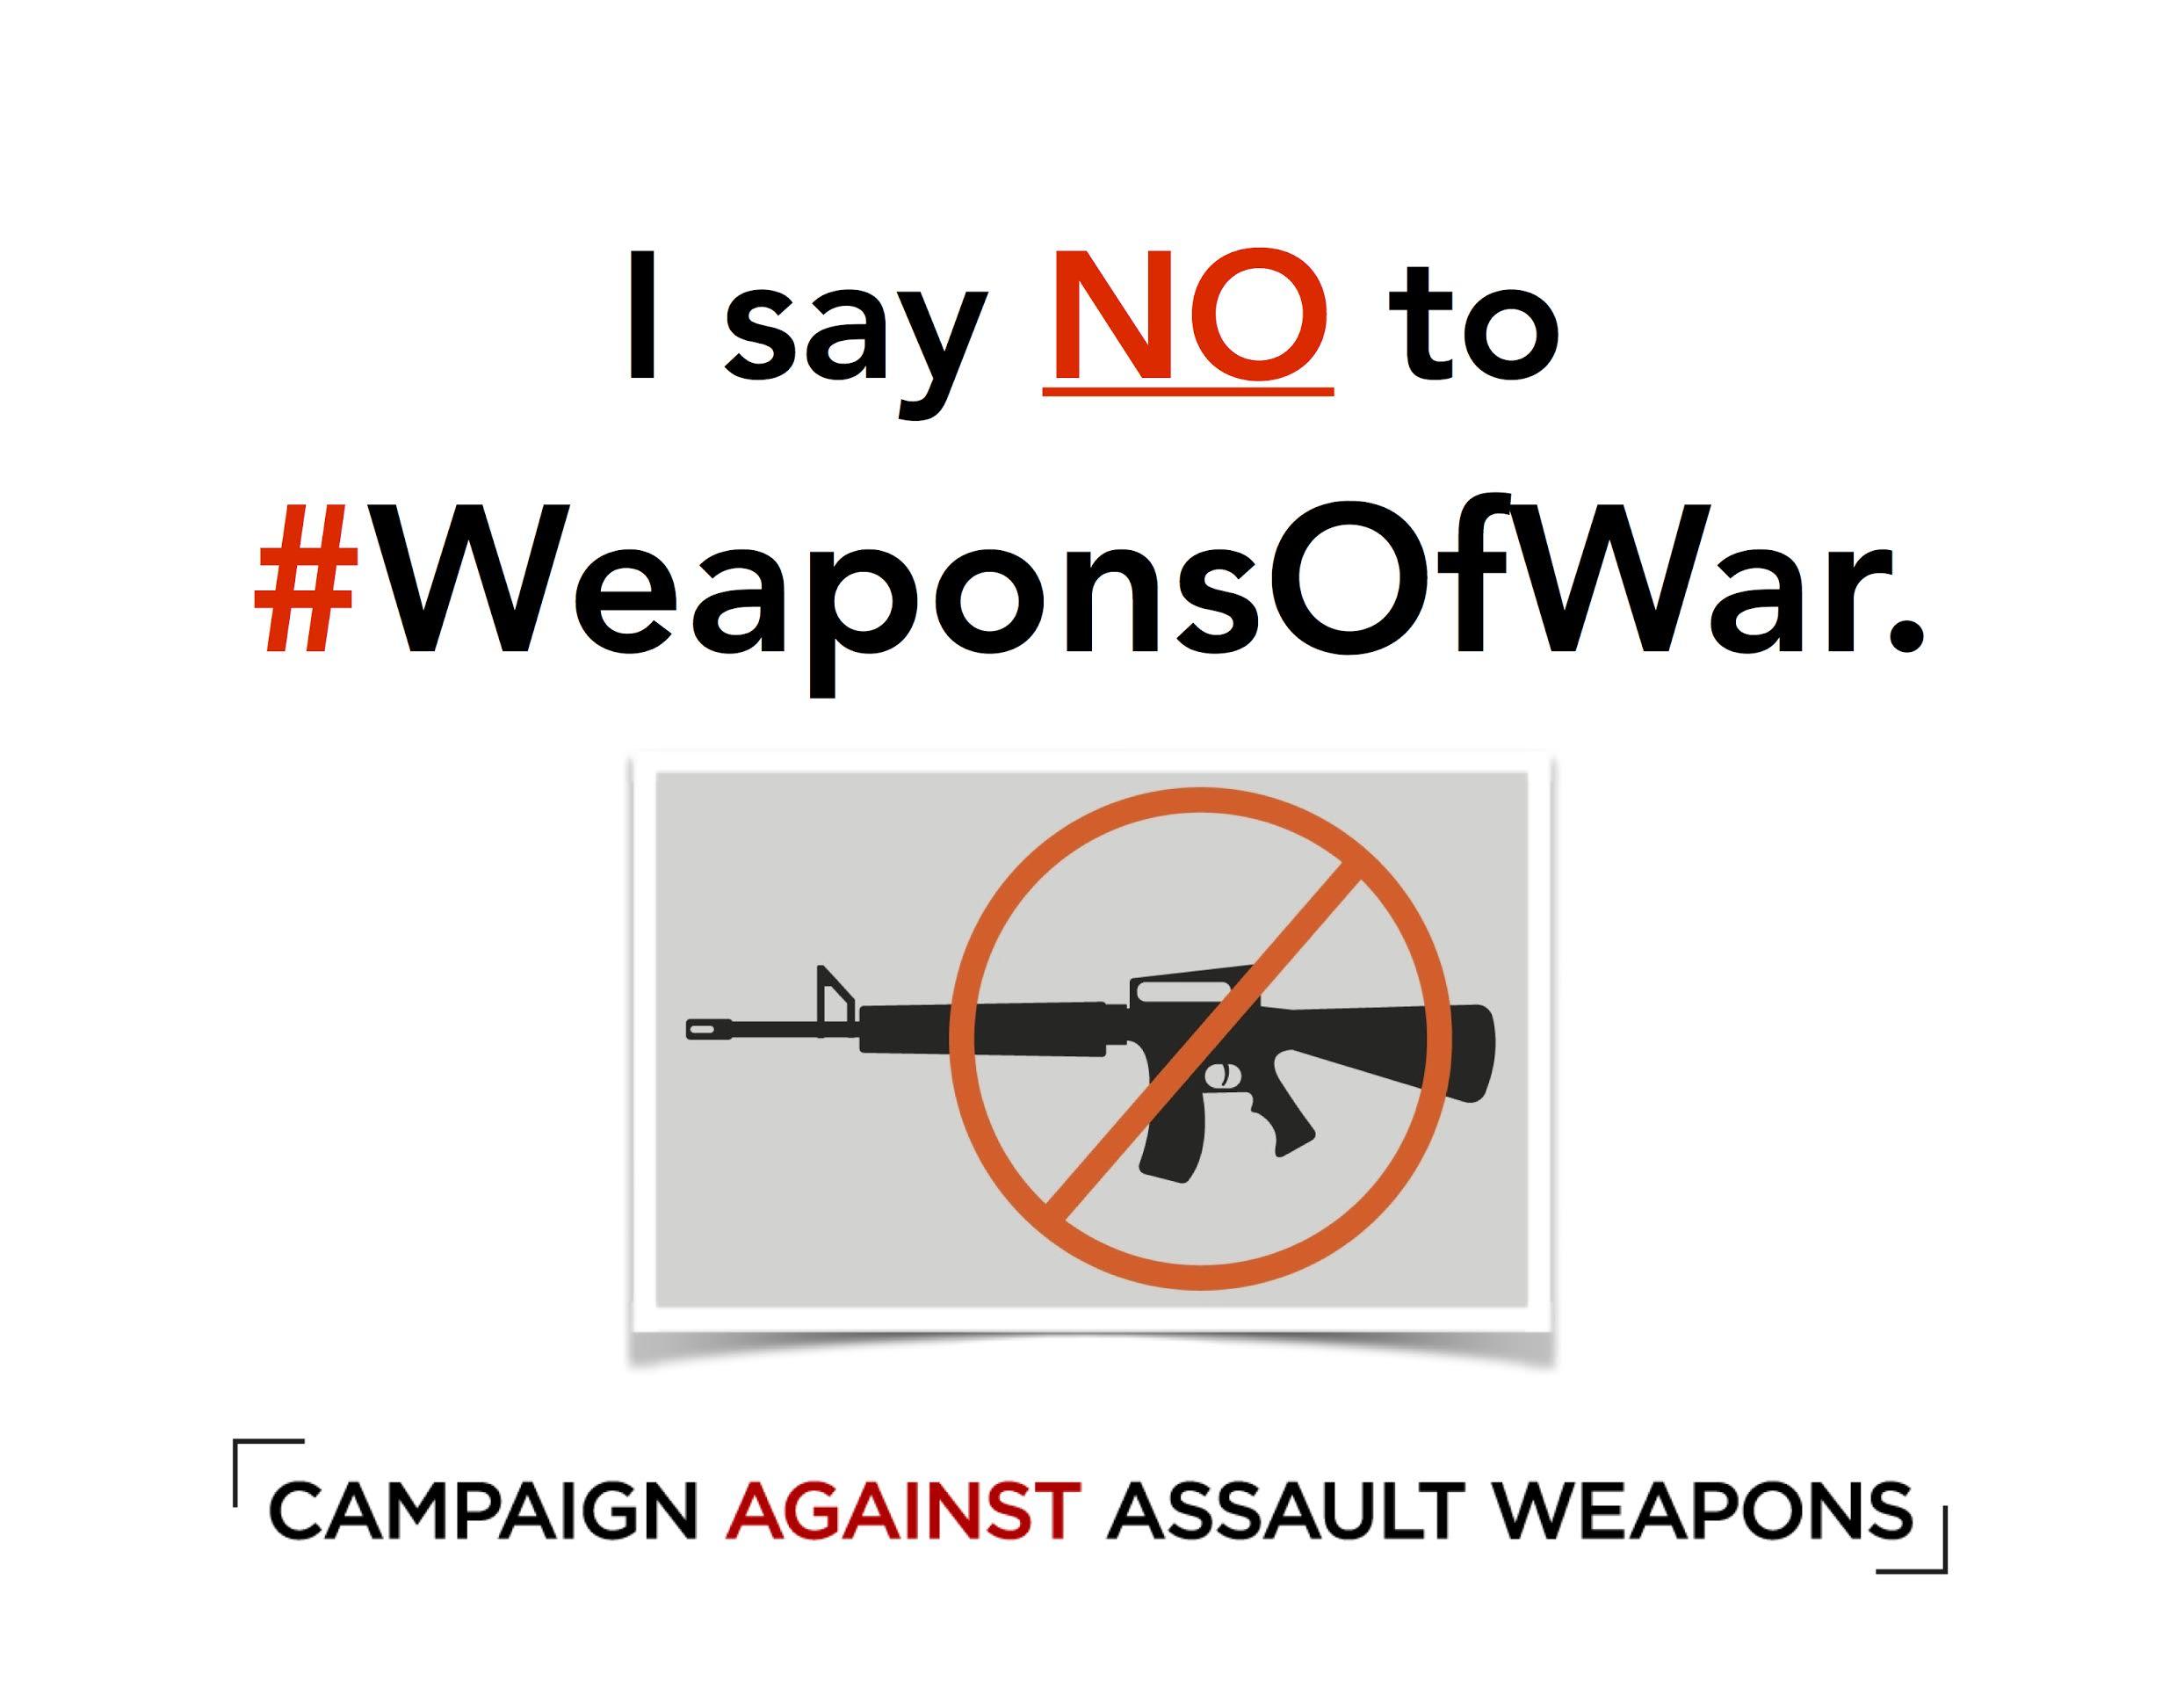 I-say-No-to-WeaponsOfWar.jpg